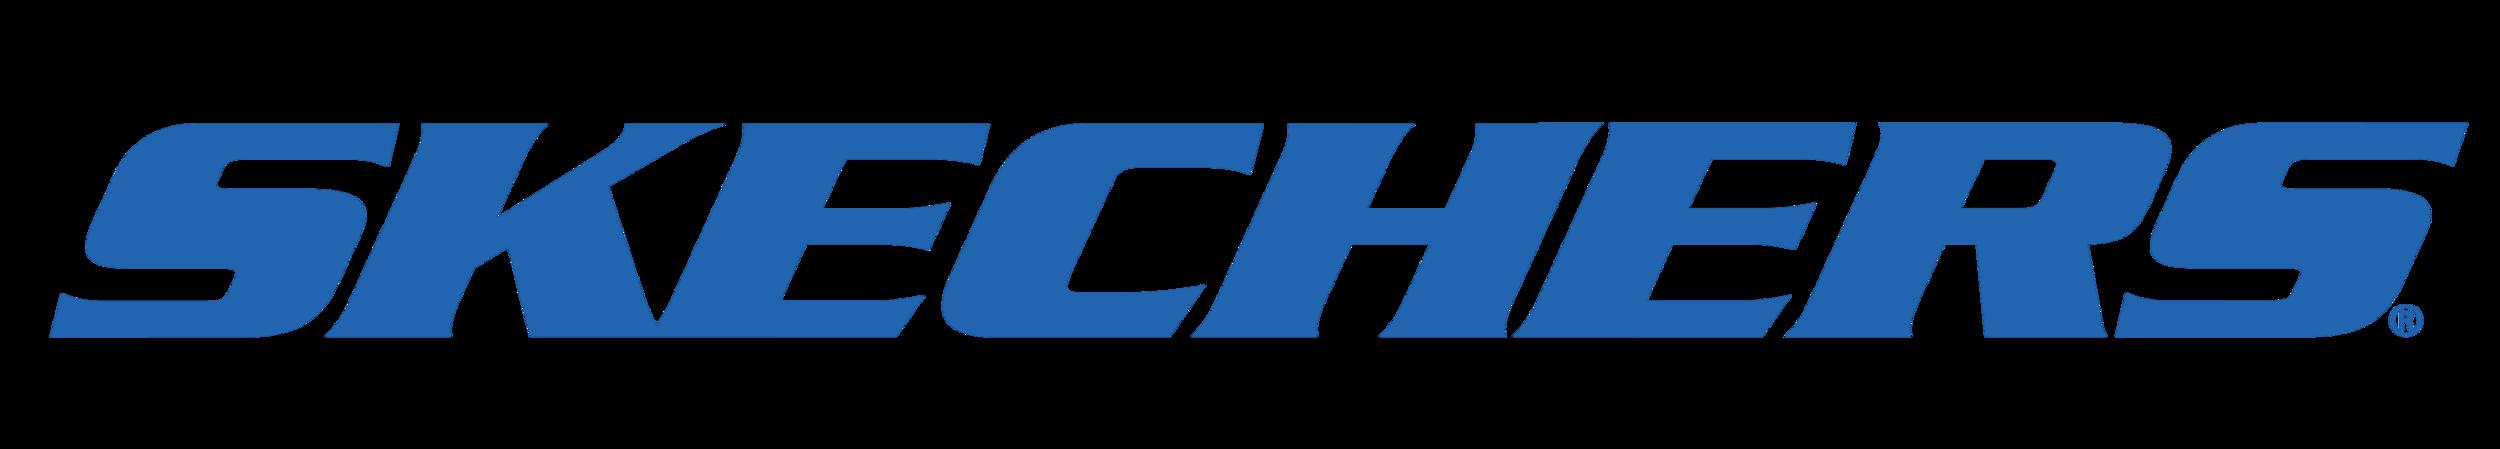 Skechers_logo_blue.png